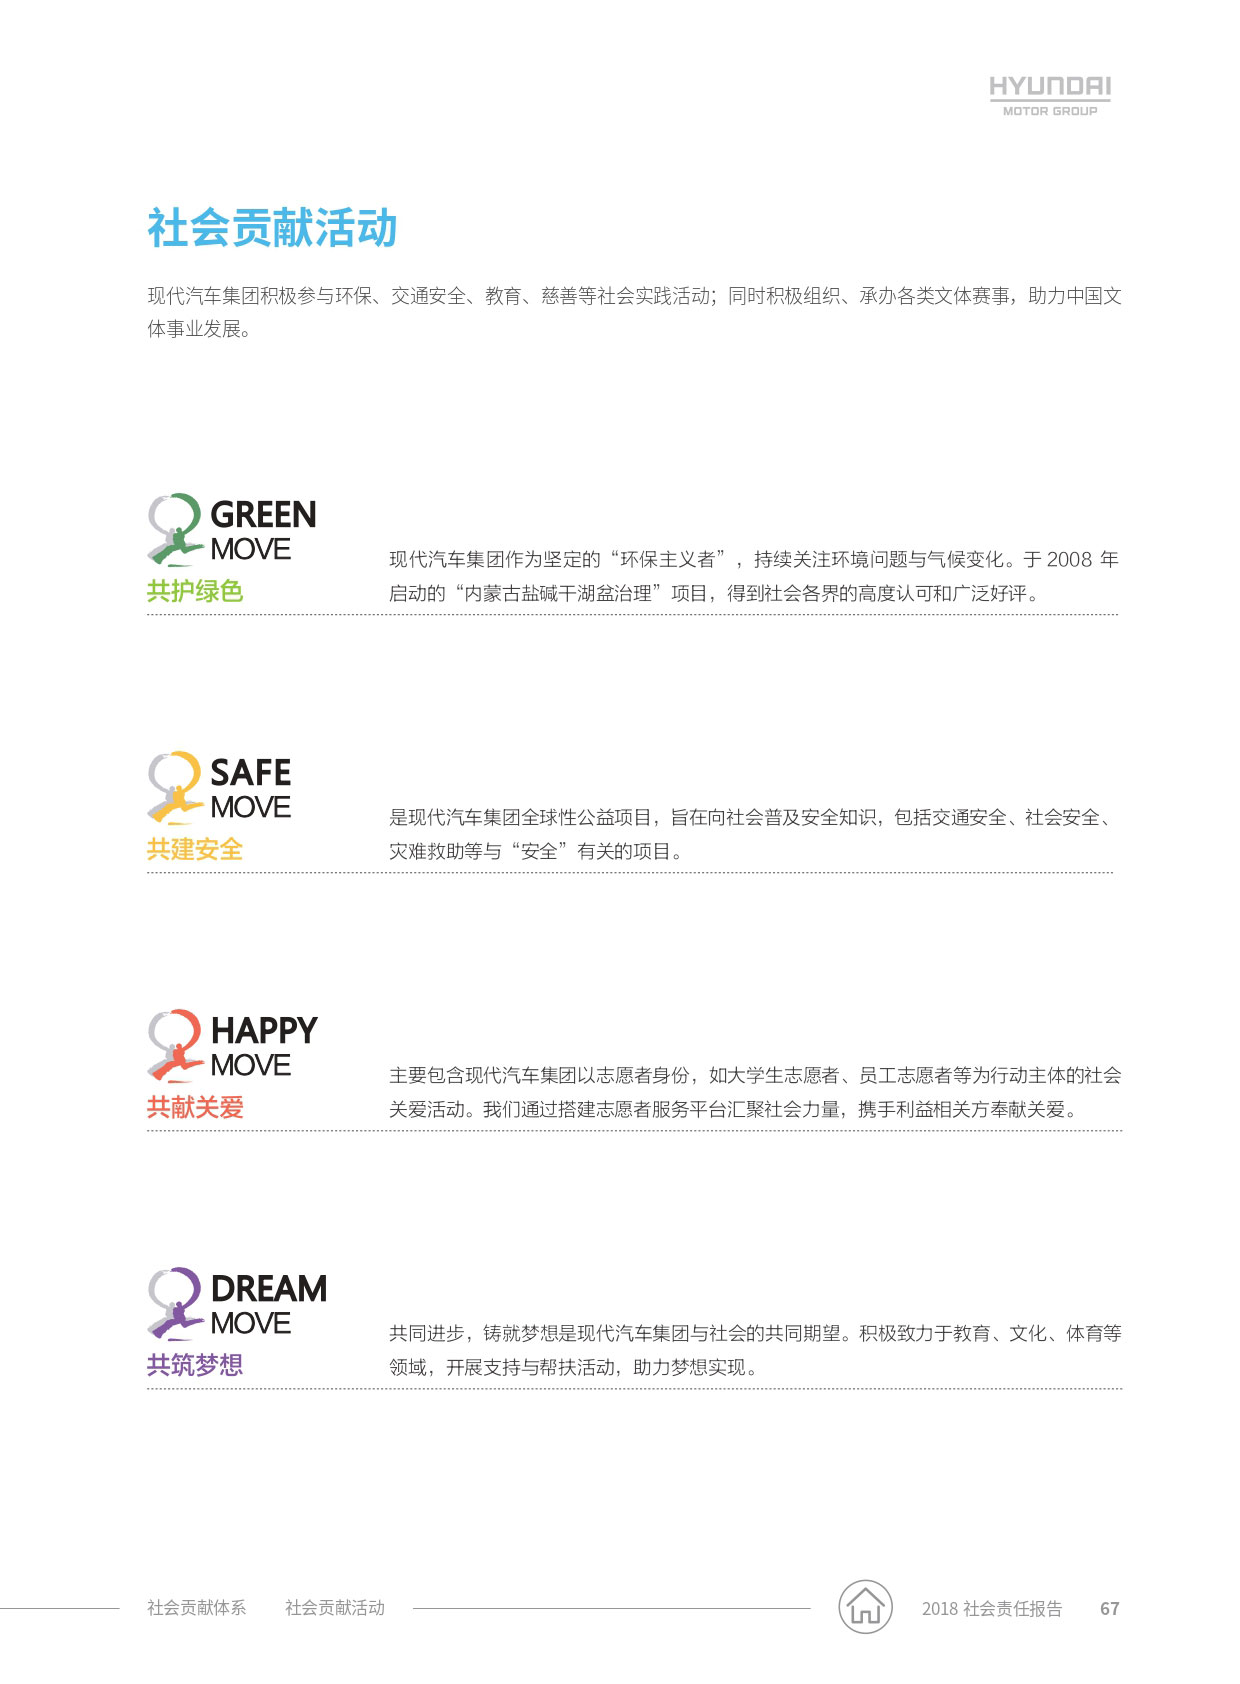 hyundai_china_csr_2018_page-0035_02